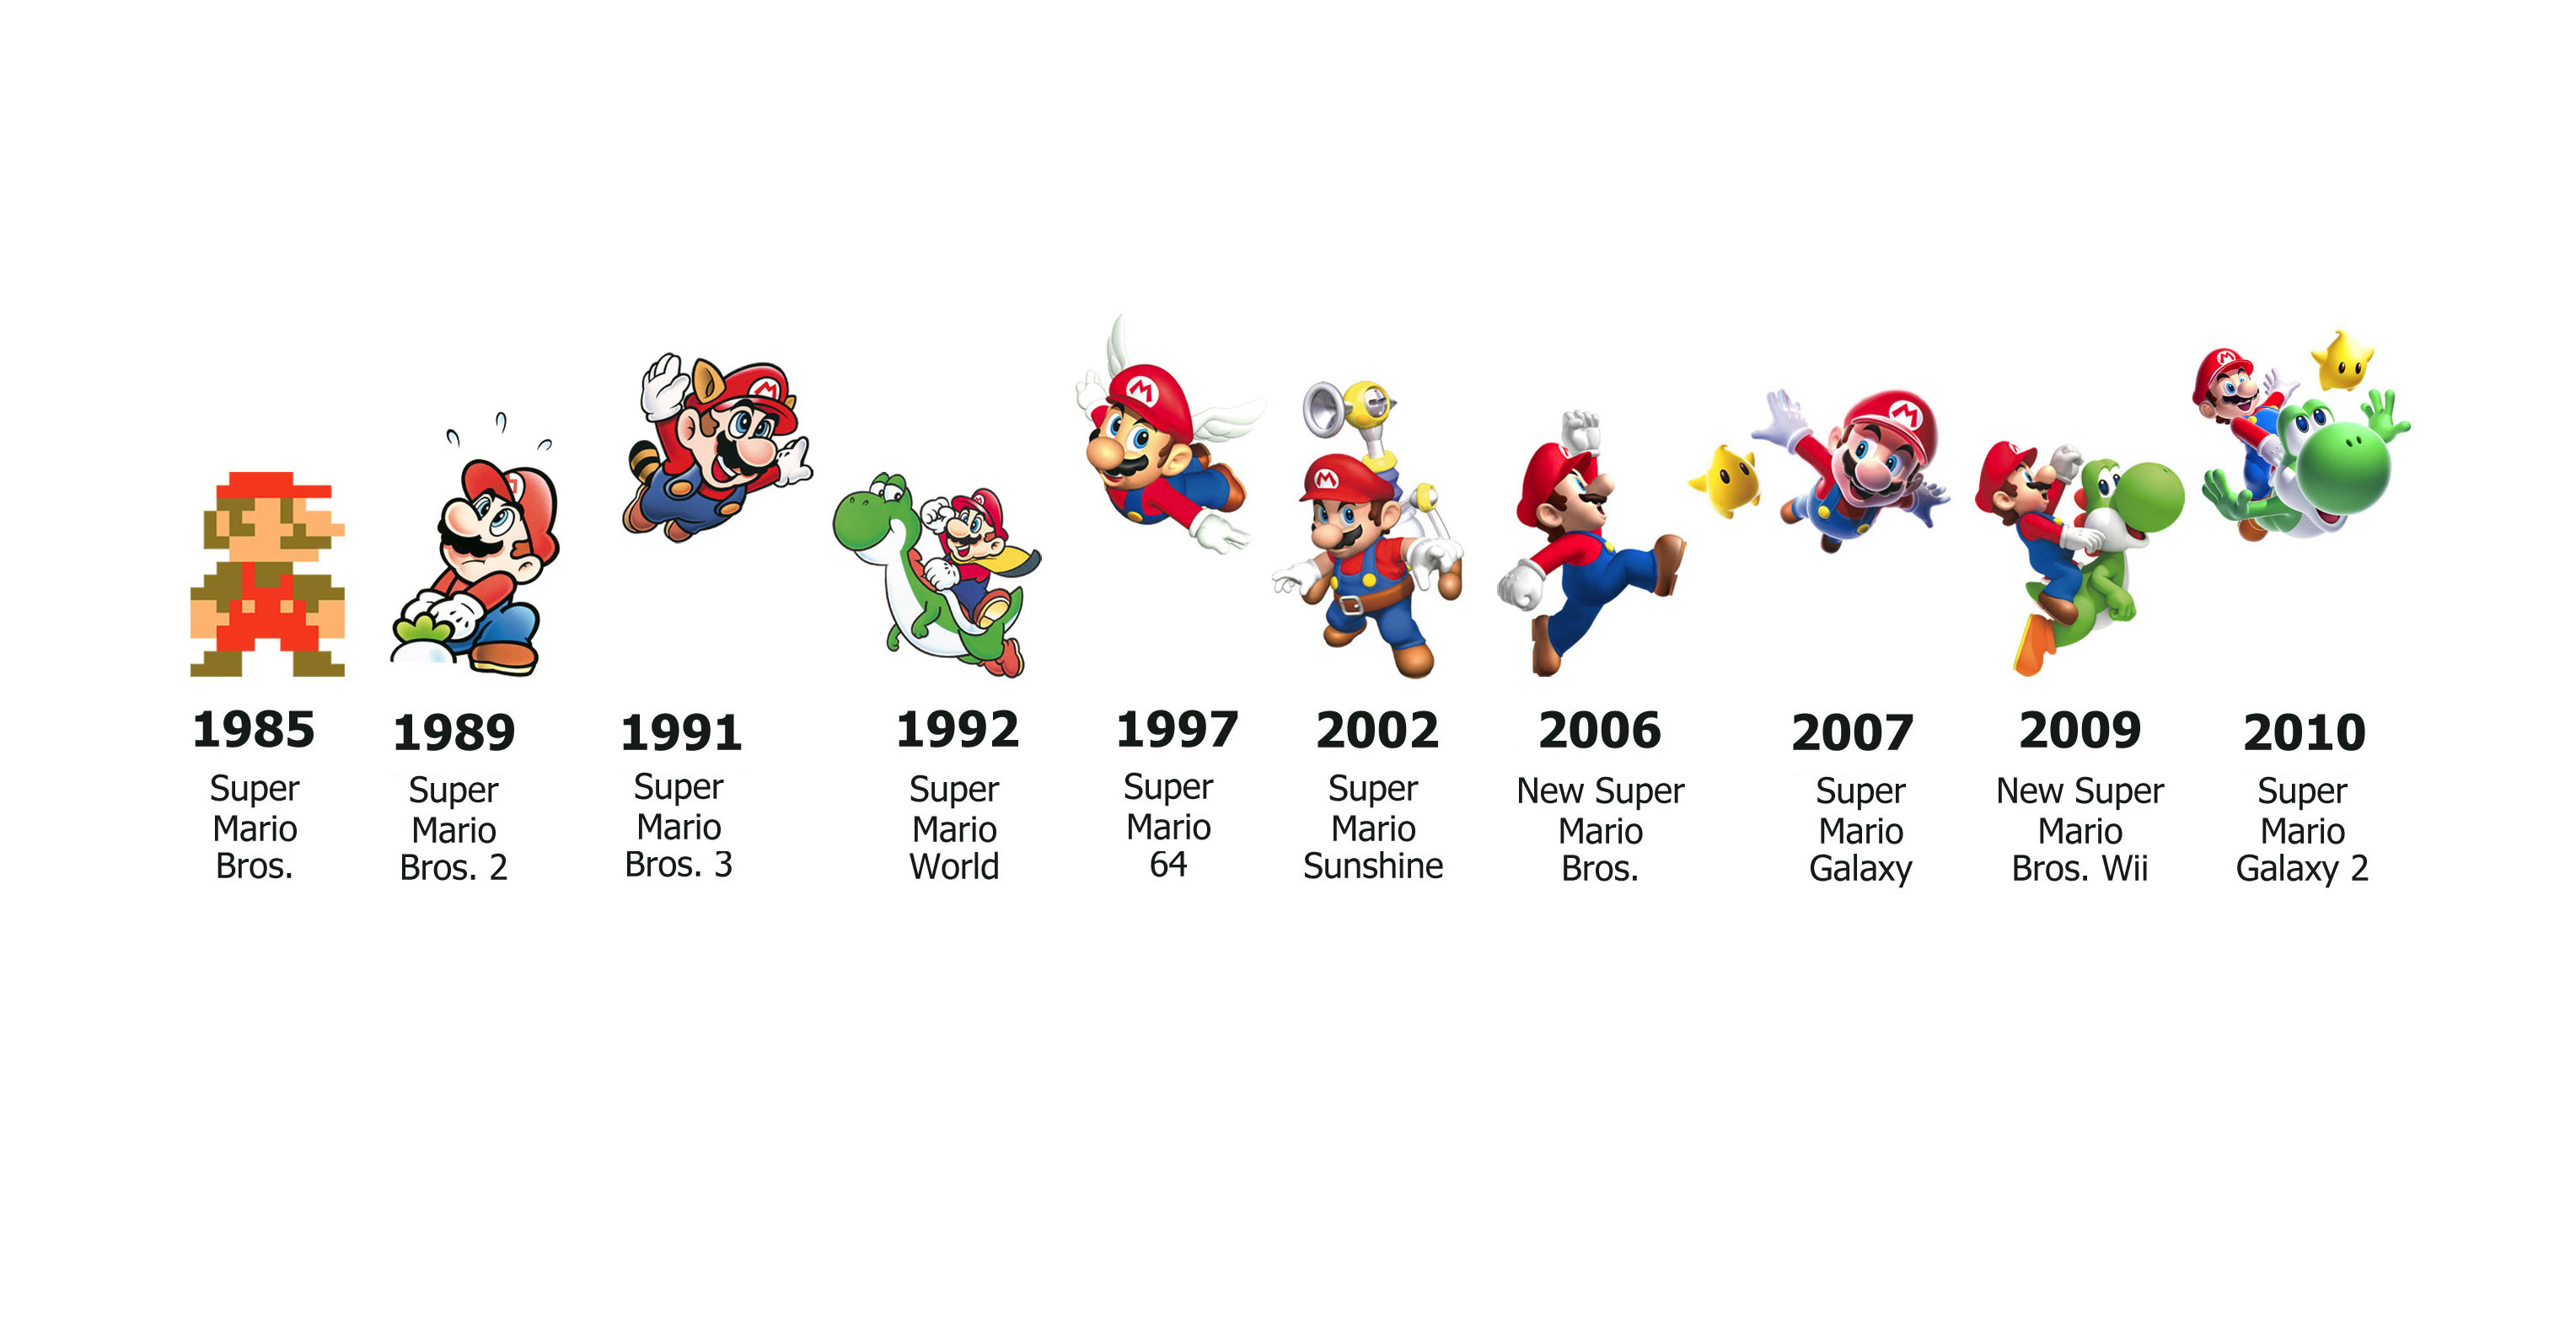 La Collection Mario Bros Fait Rêver Les Retrogamers